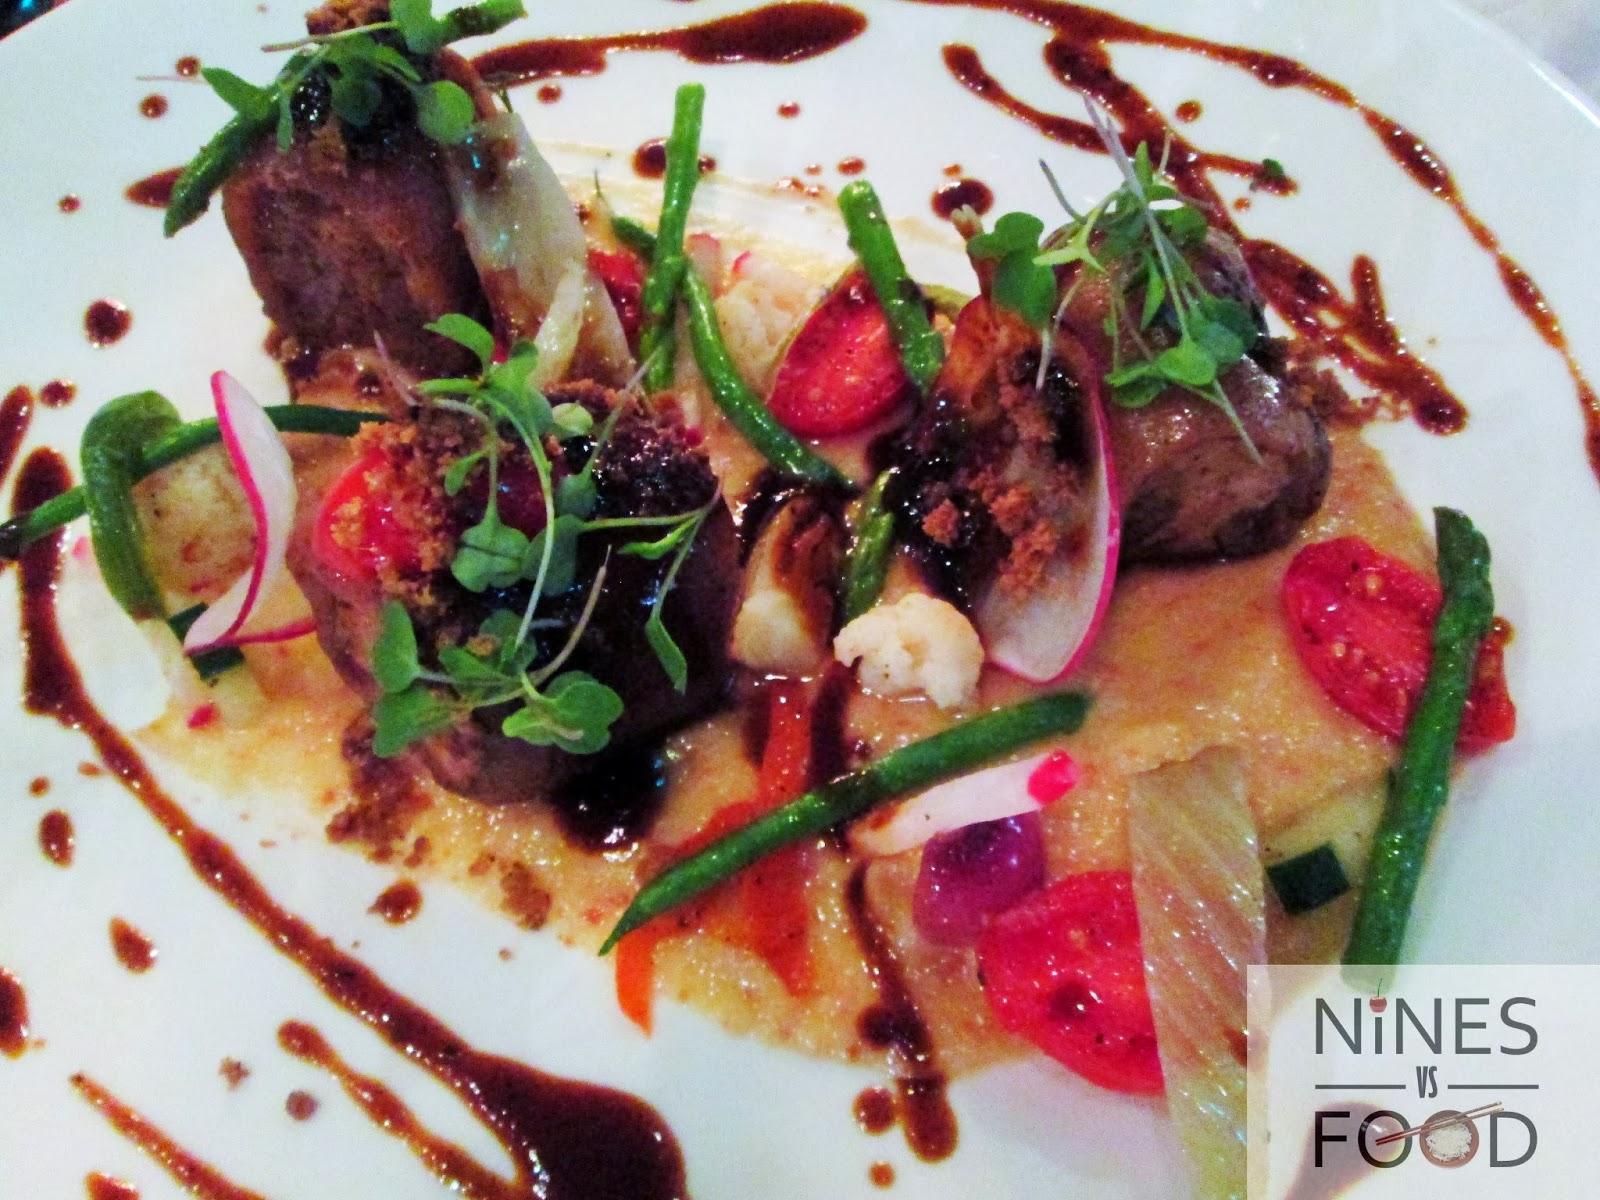 Nines vs. Food - Olive Tree Kitchen and Bar-23.jpg